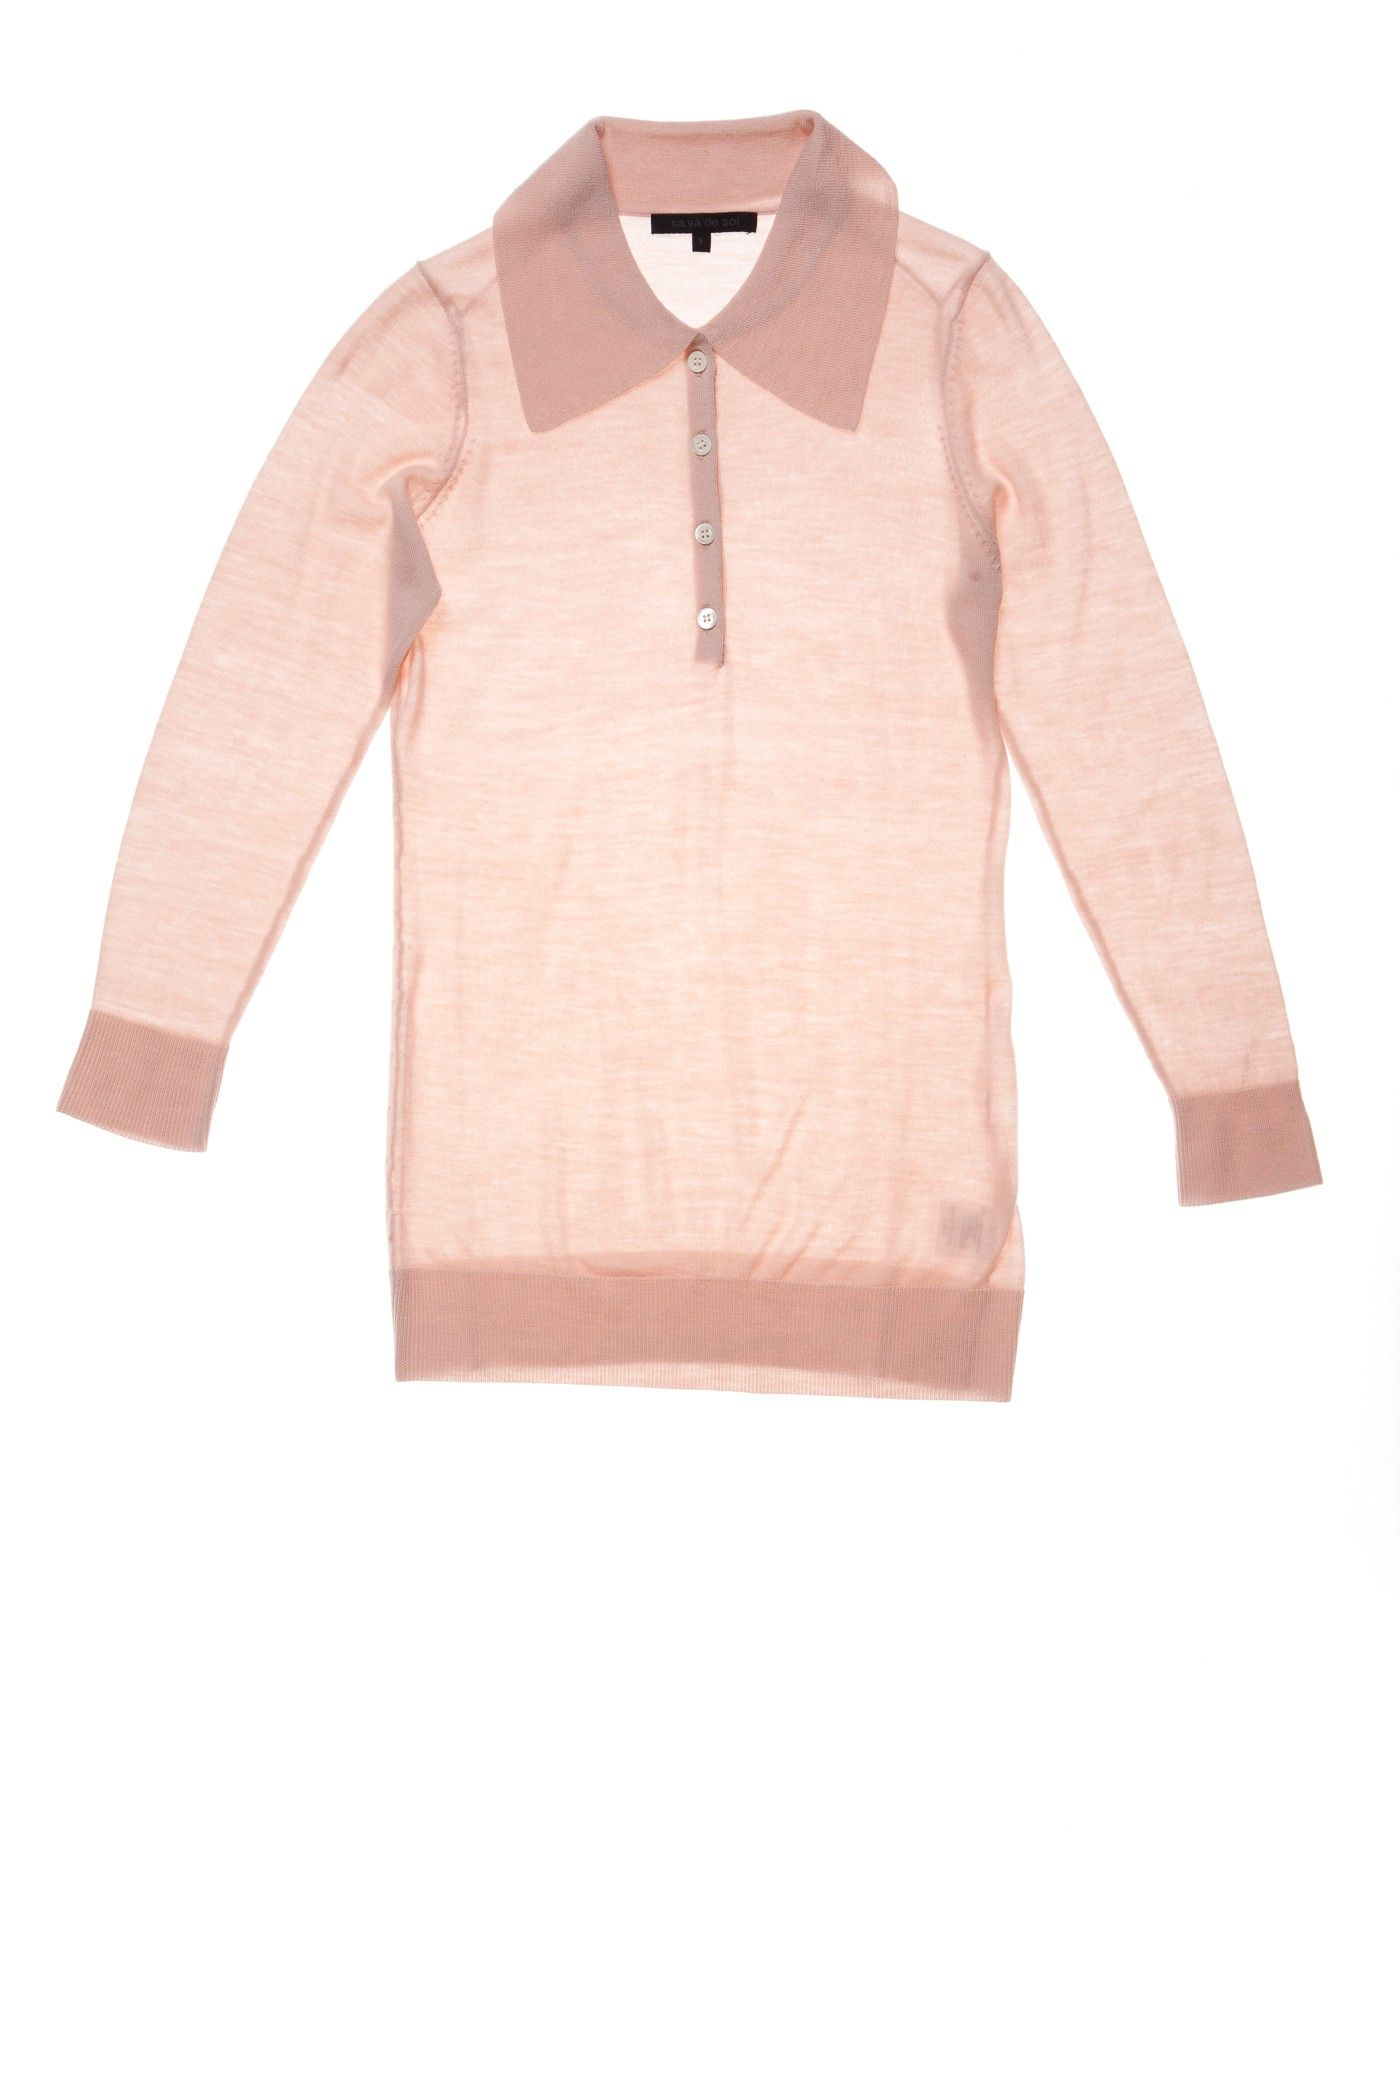 Toni   3/4 sleve polo   Extra-Fine Merino Super 140 #cavadesoi #cvds #knitwear #fashion #wool #merino #polo #sweater #pink #rose #geisha // February